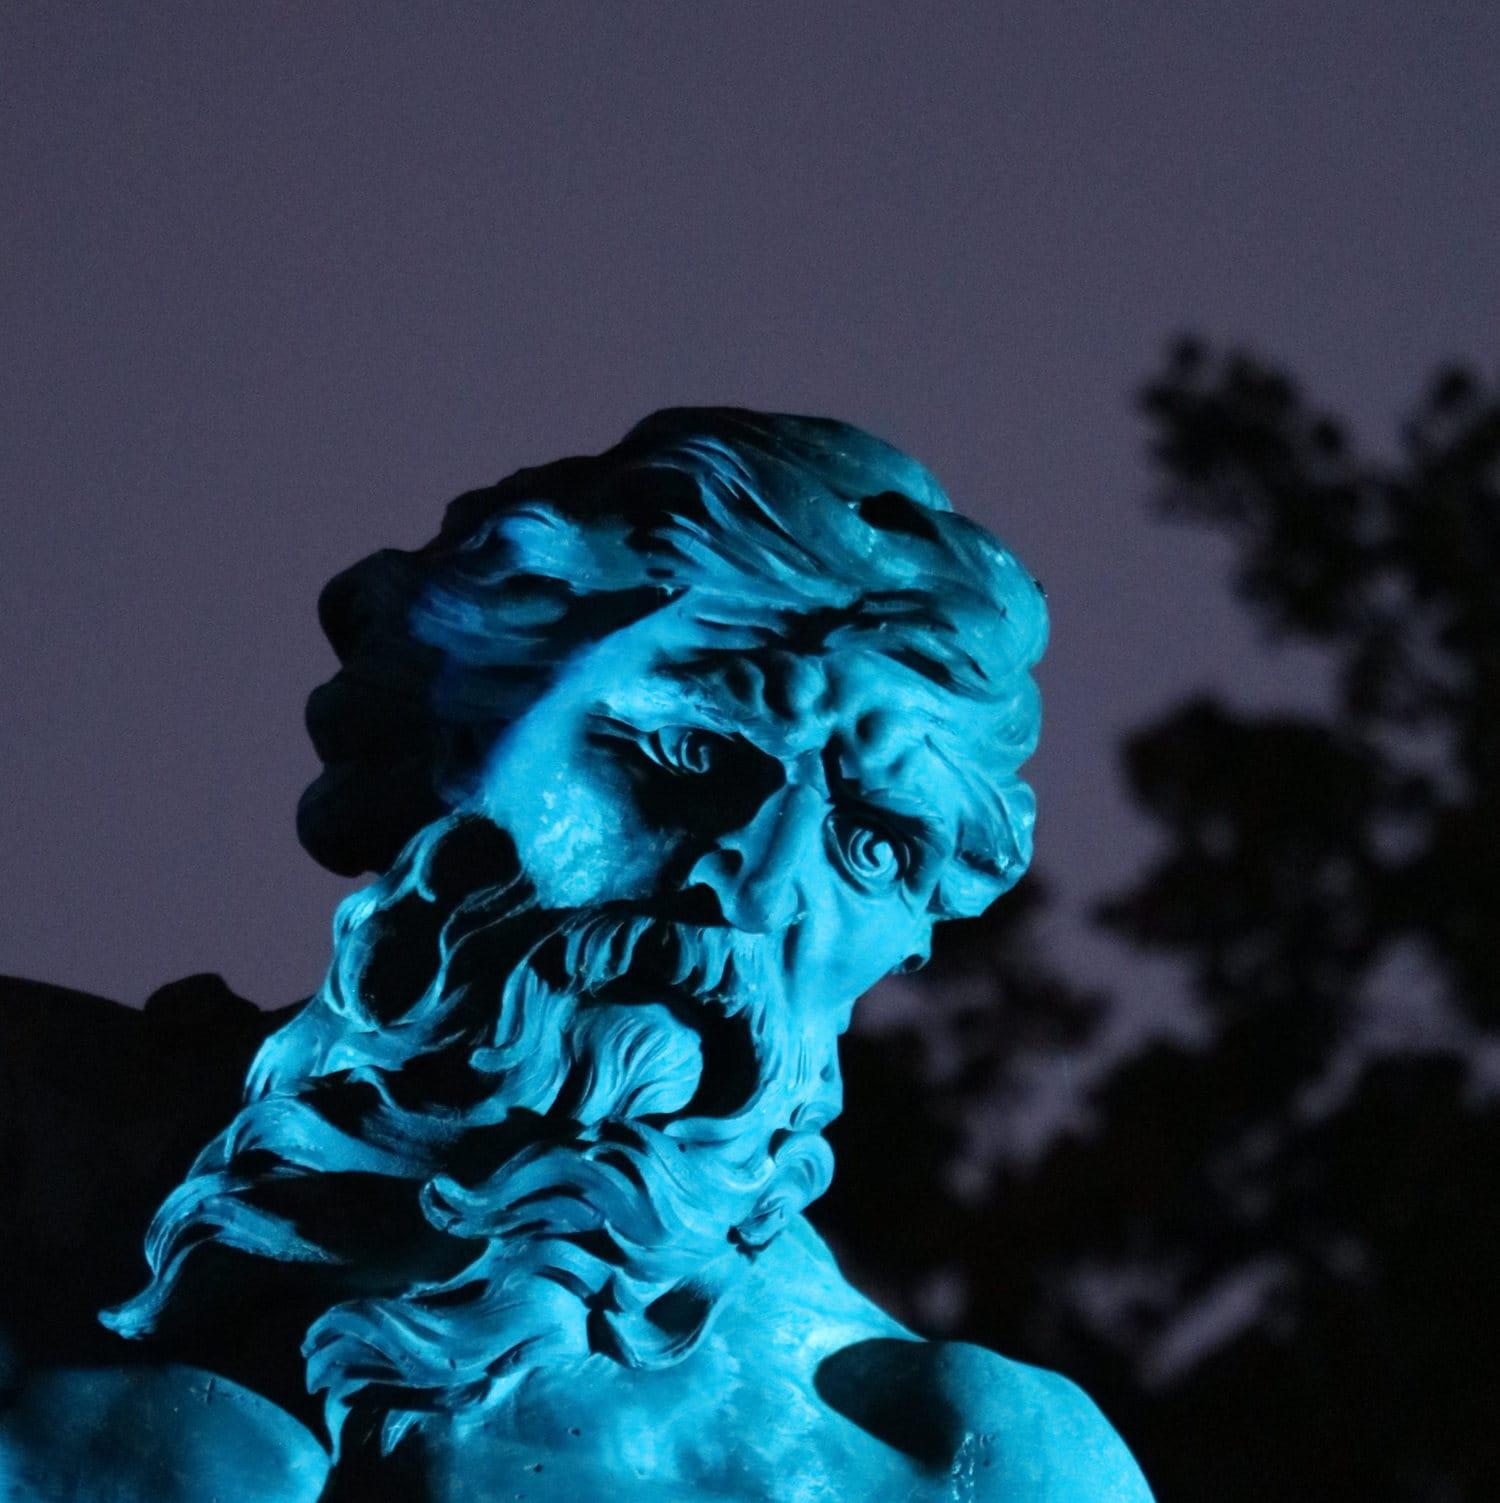 estatua canon 750d